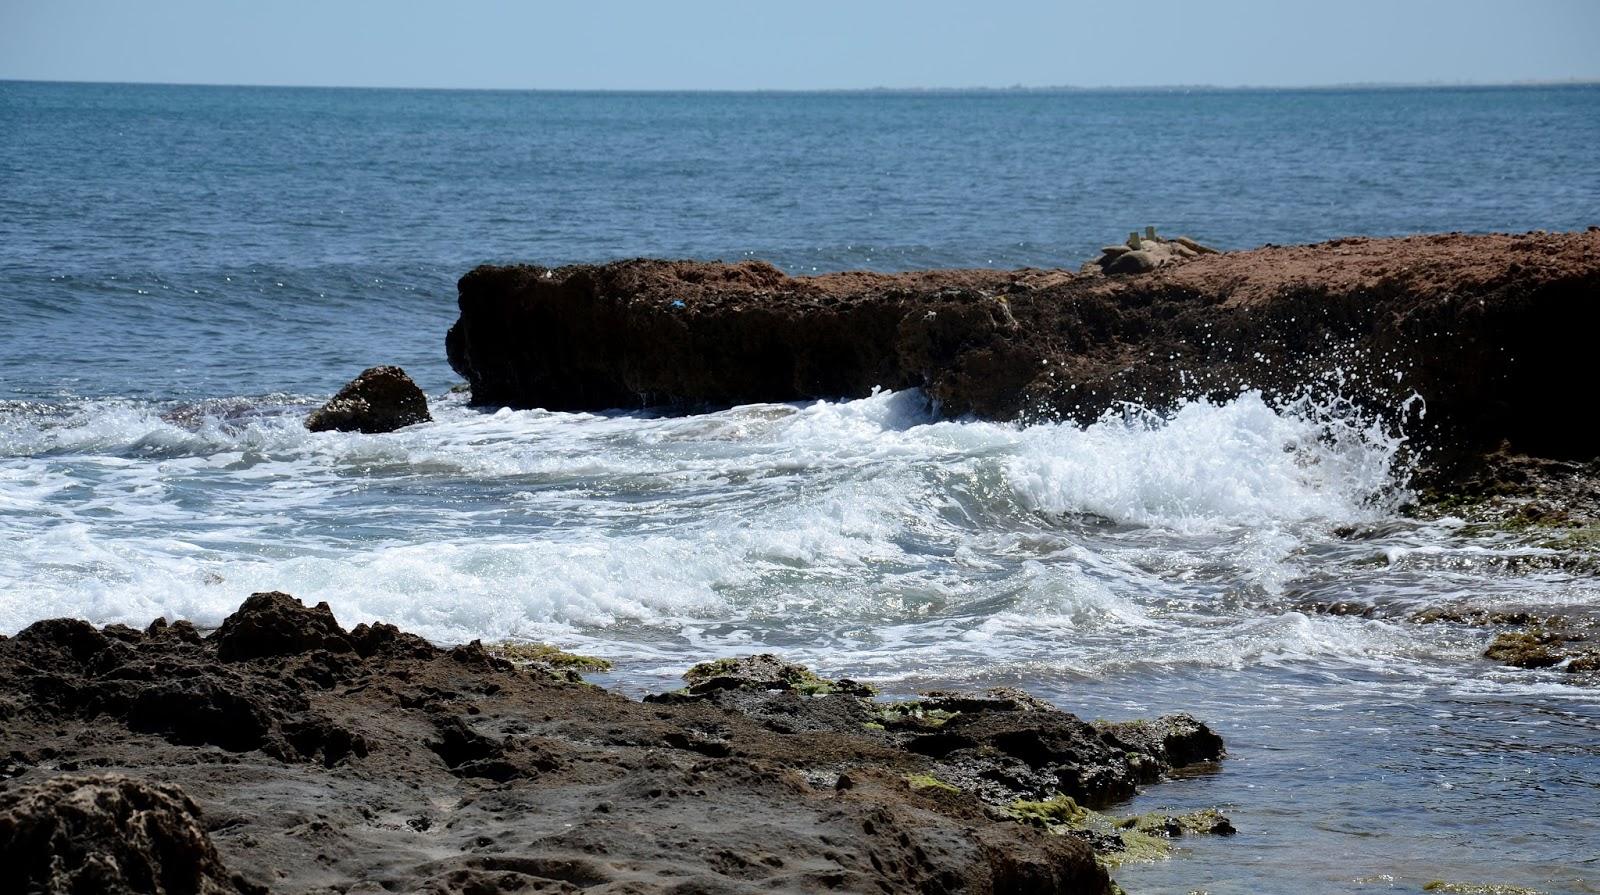 Escritura De La Mano Te Amo En La Arena Y La Playa Imagen: Bons Moments. Àngels: LECTURES